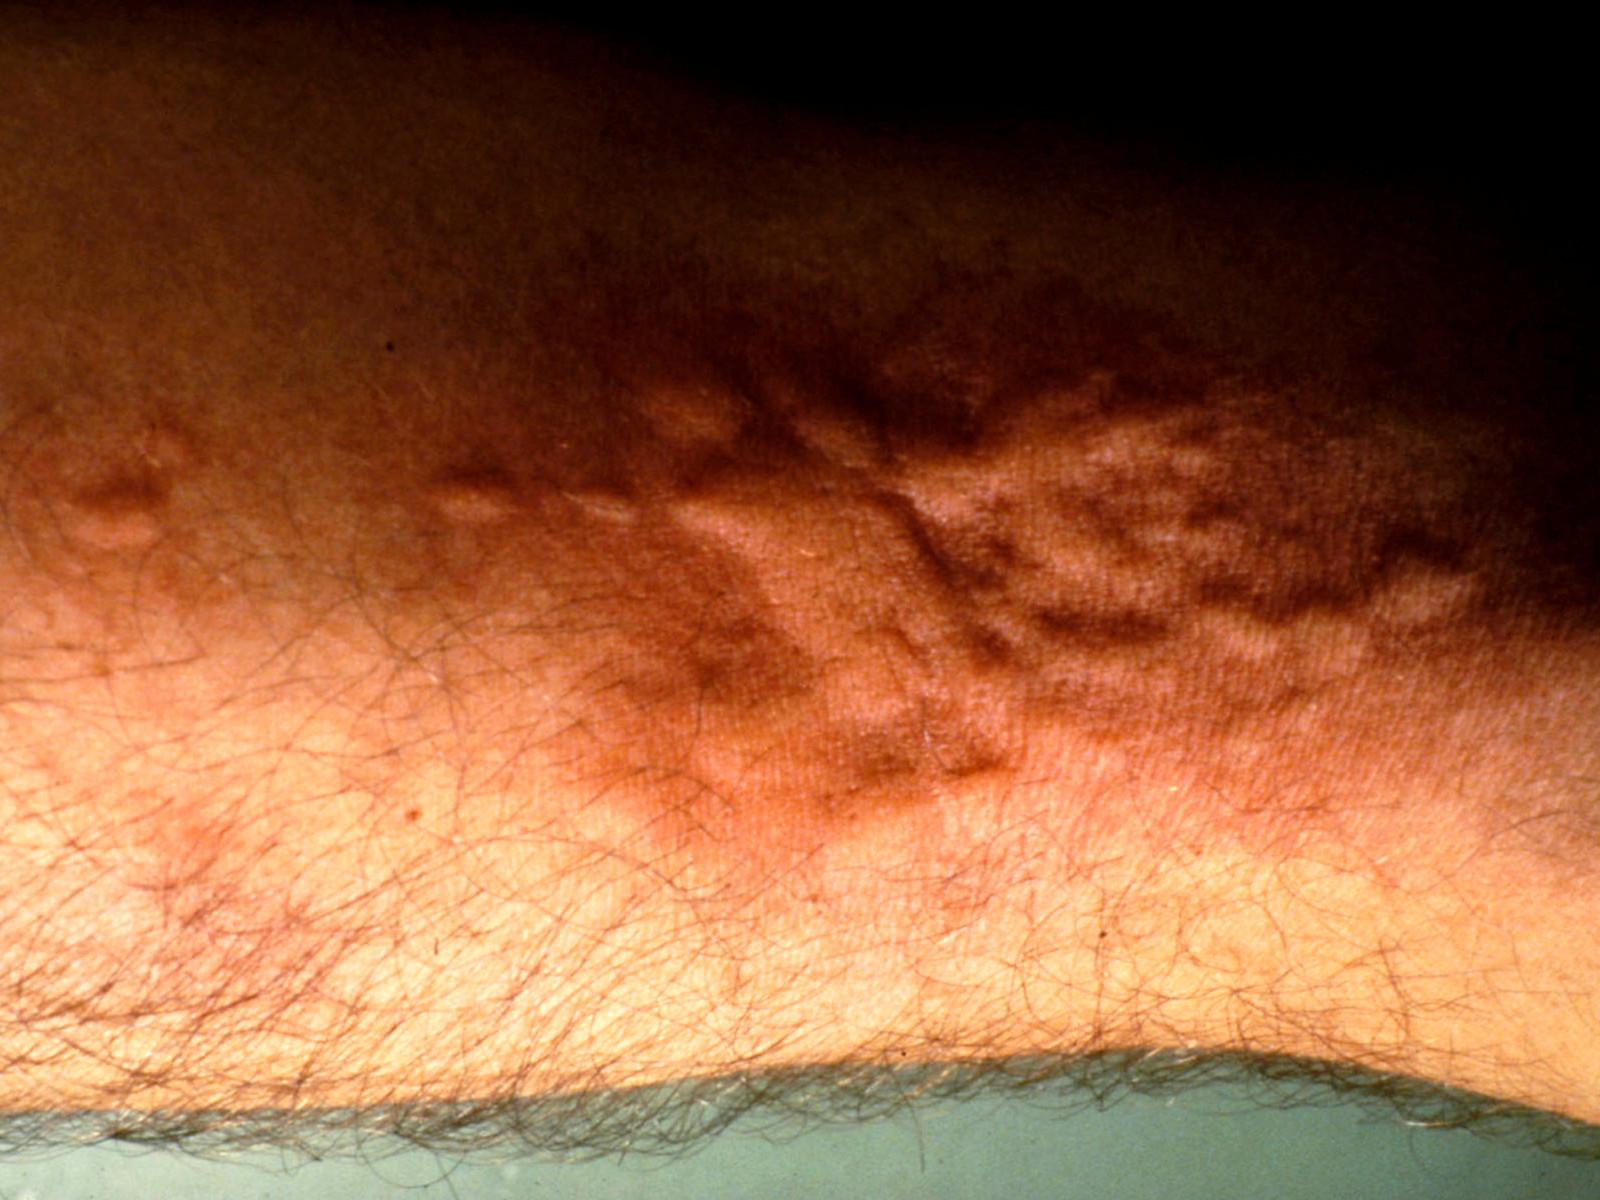 allergie latex